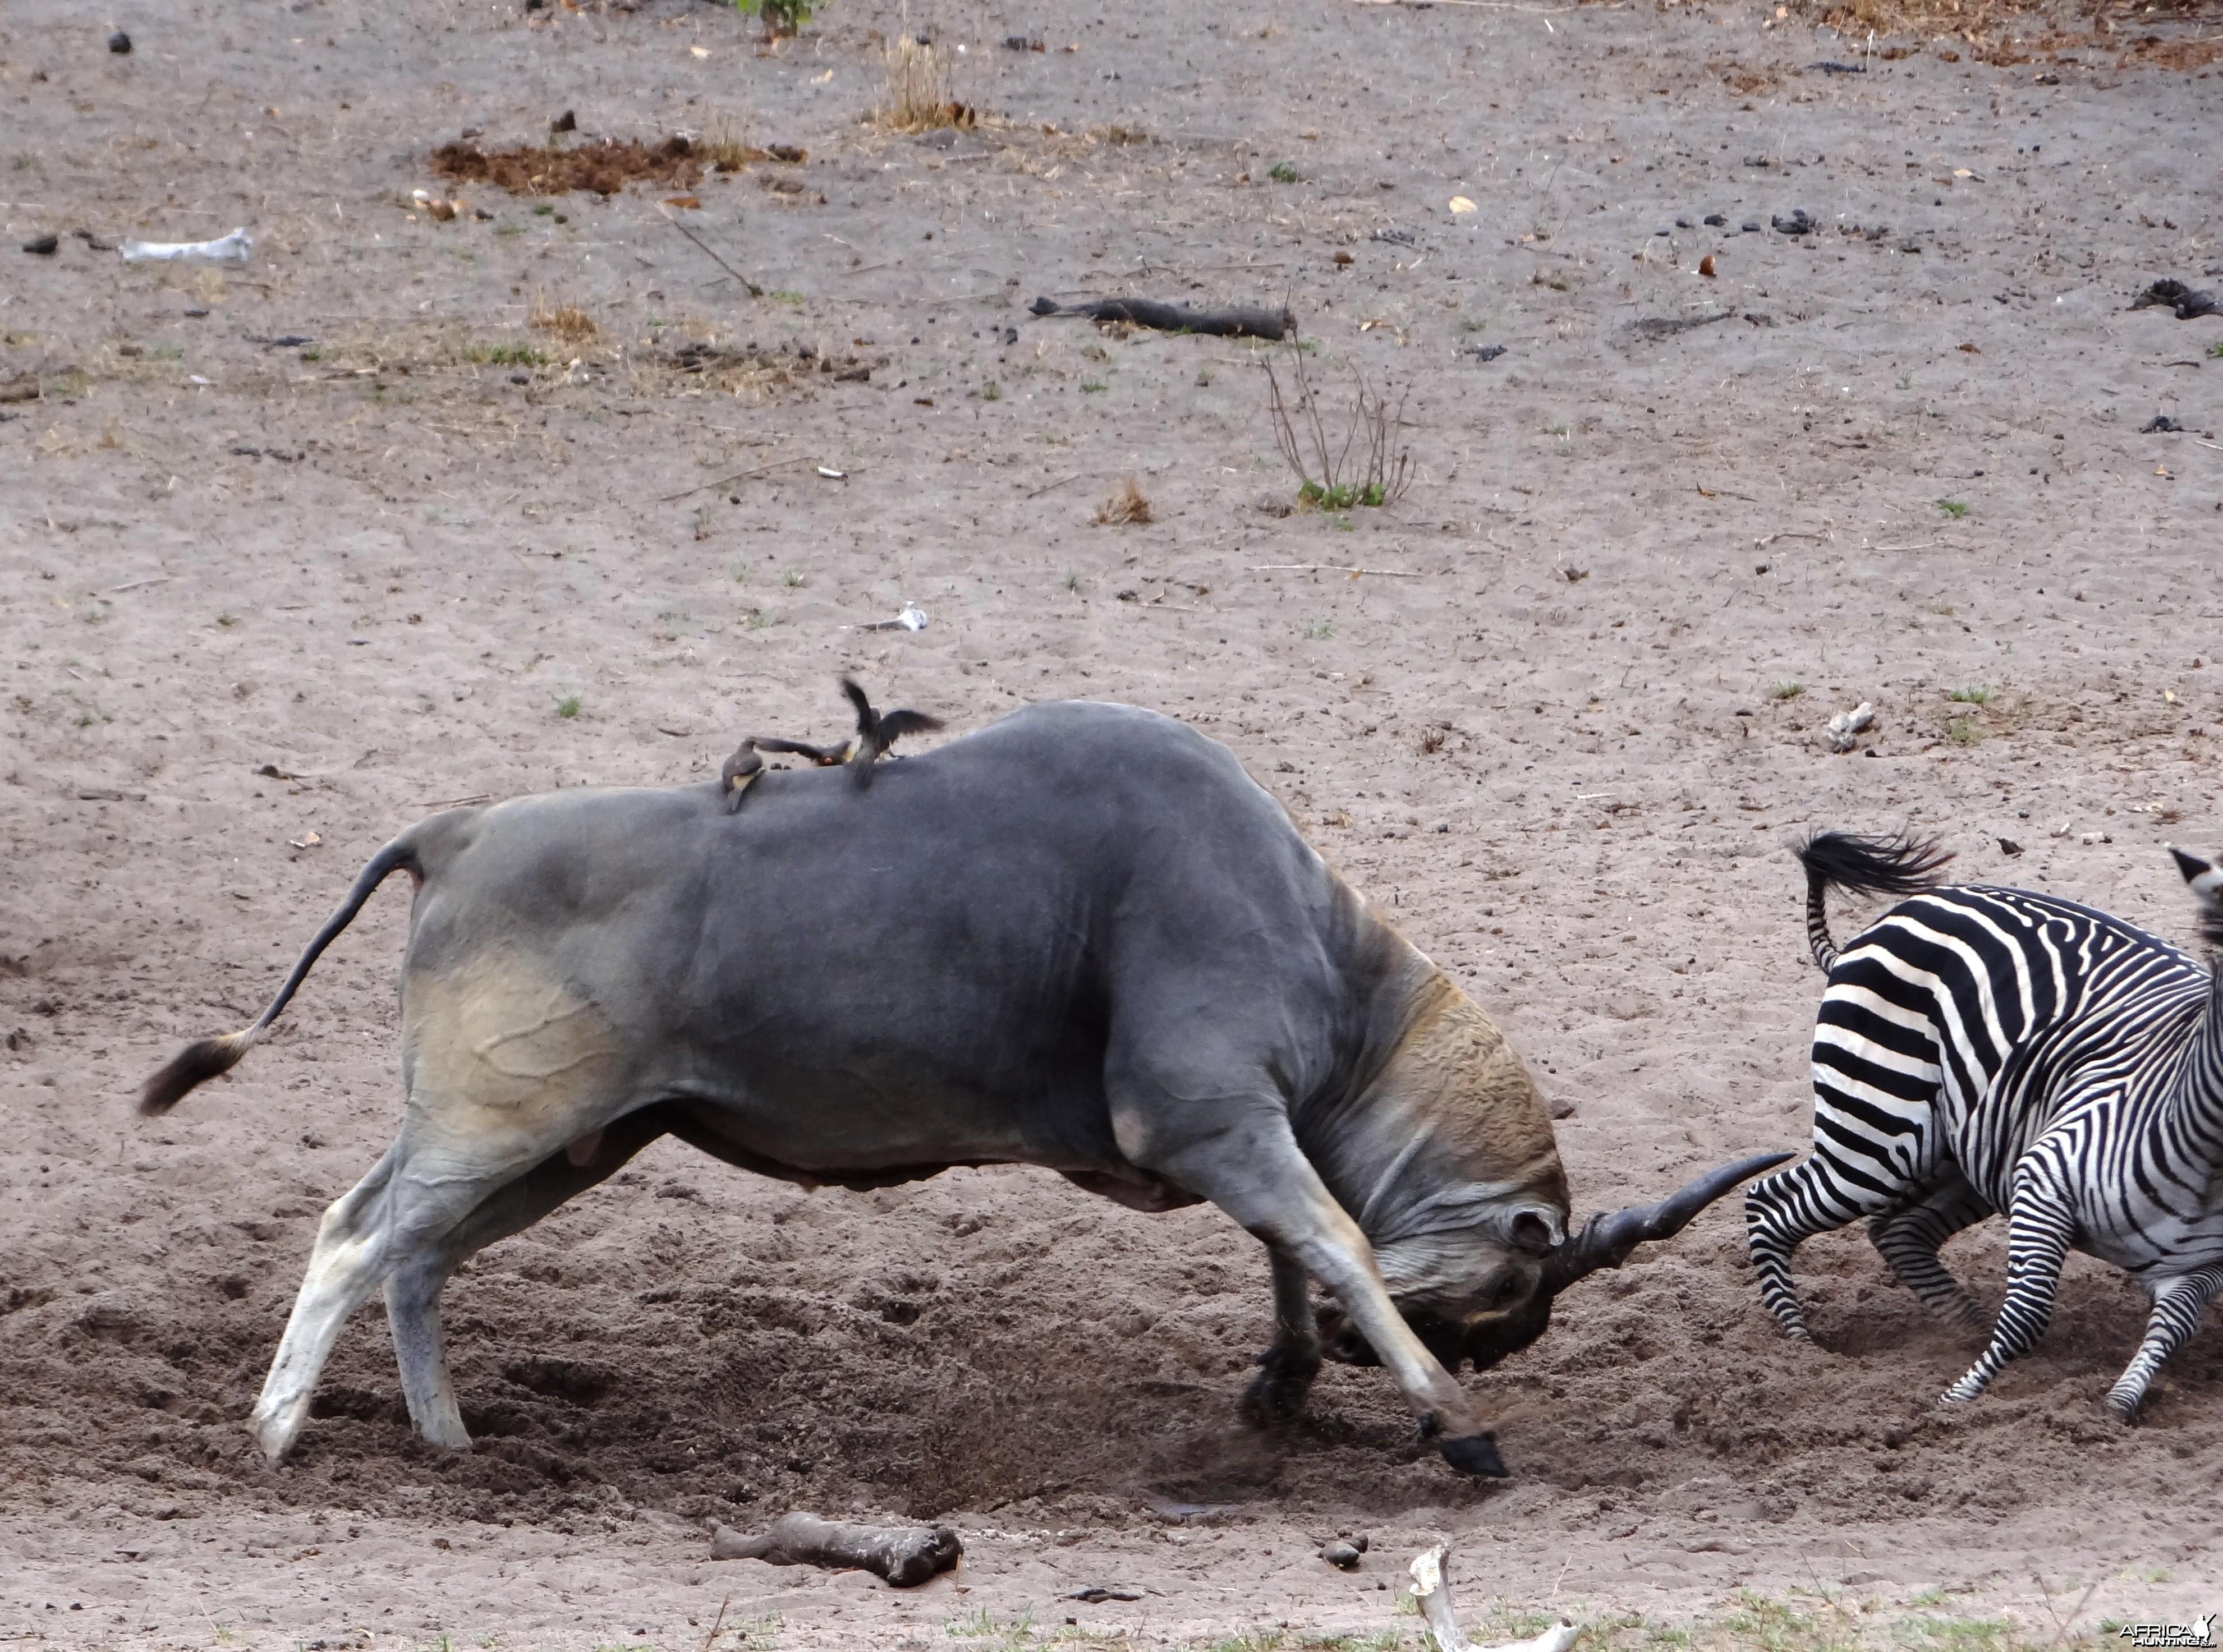 Eland Tanzania